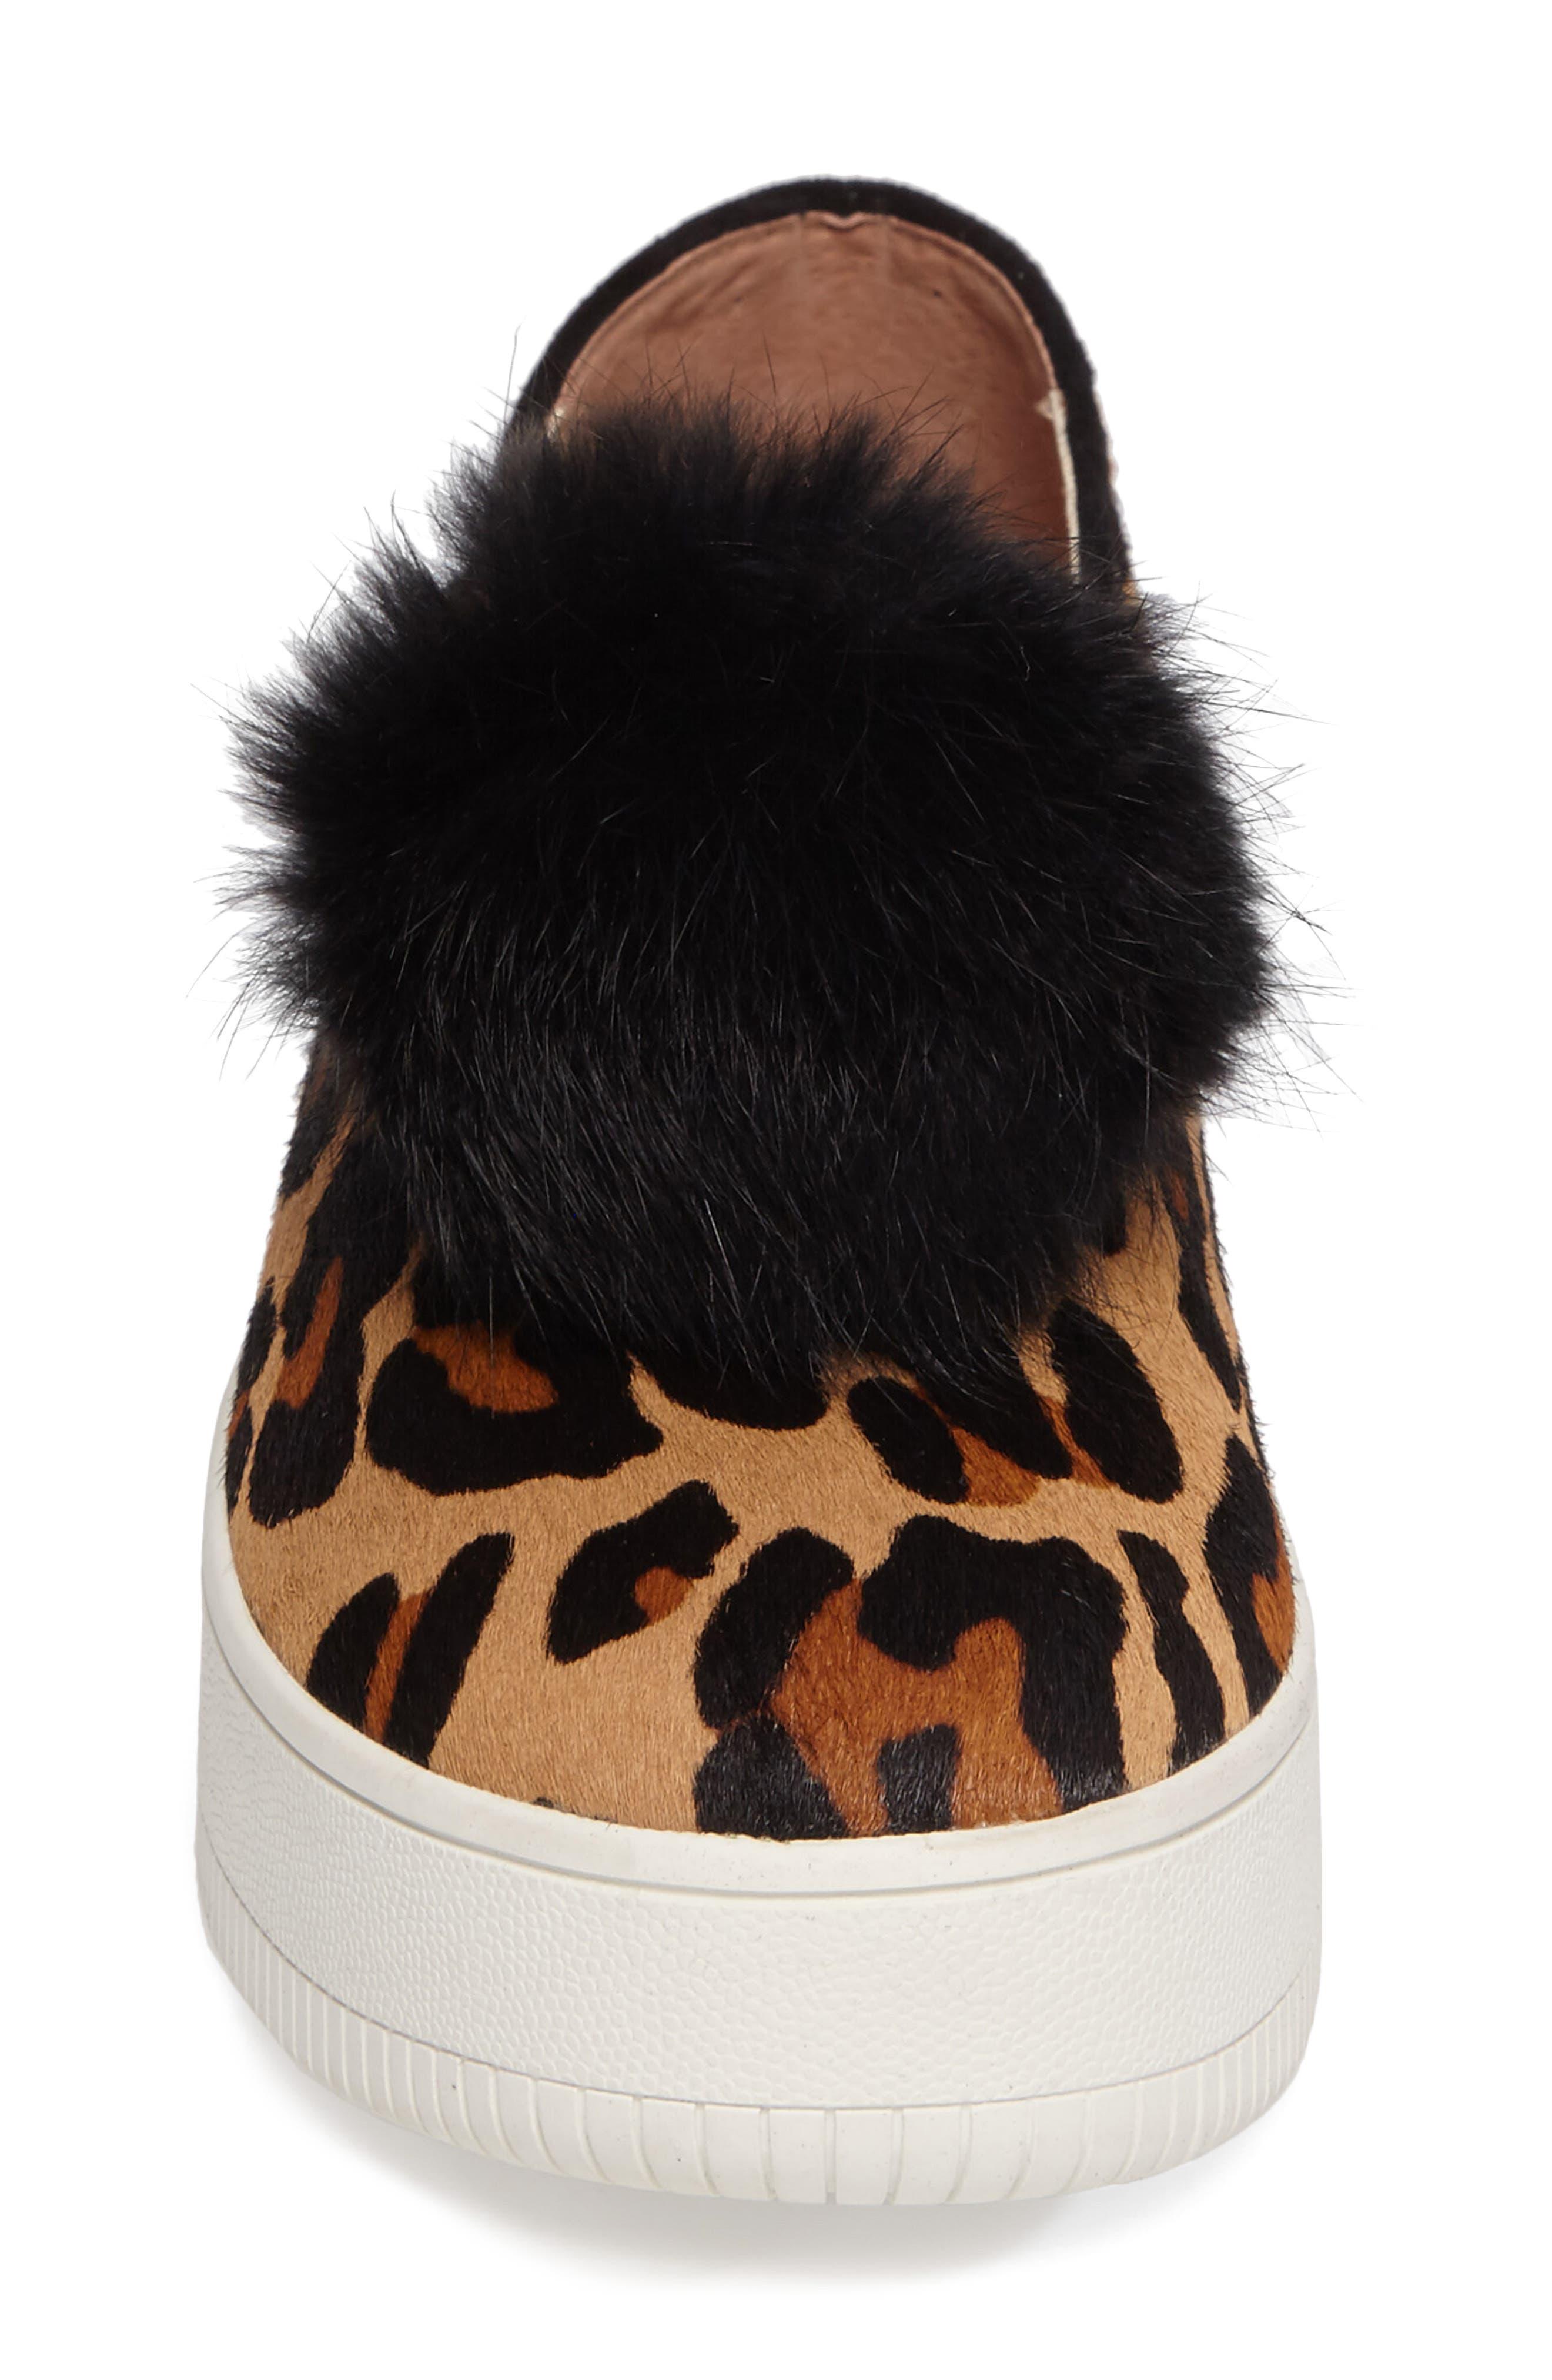 Sammy II Genuine Calf Hair Platform Sneaker with Genuine Rabbit Fur Trim,                             Alternate thumbnail 4, color,                             215